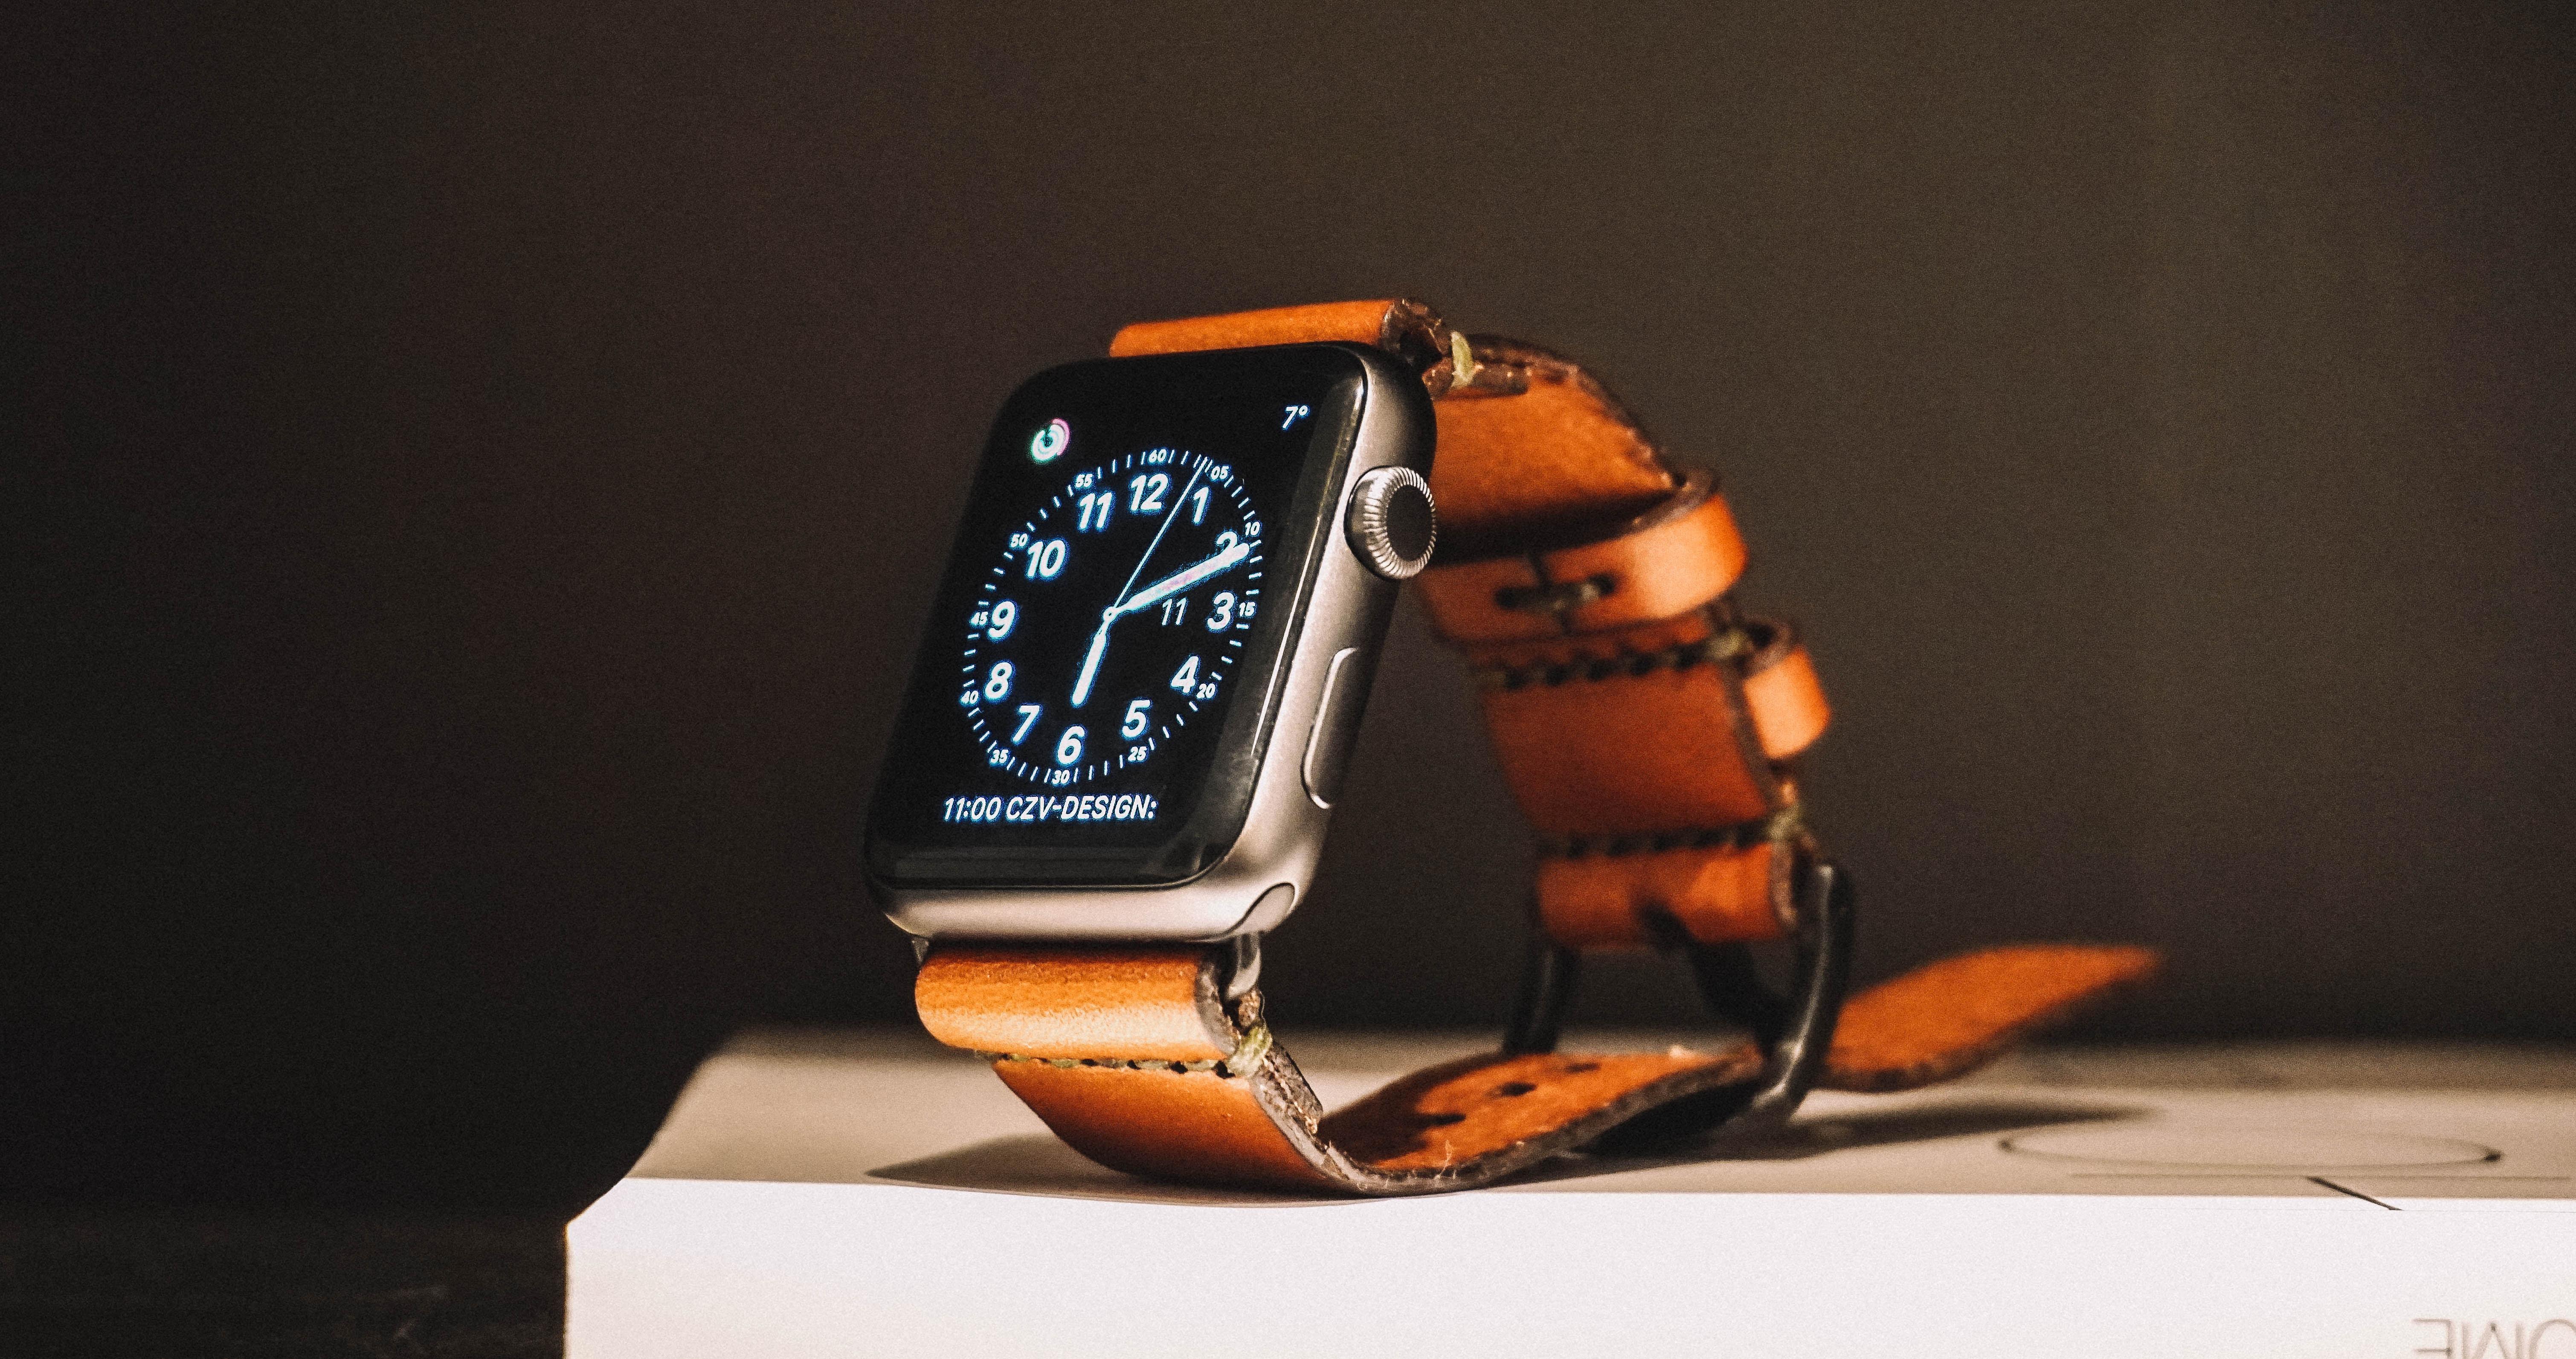 jens-kreuter-digital-watch-unsplash